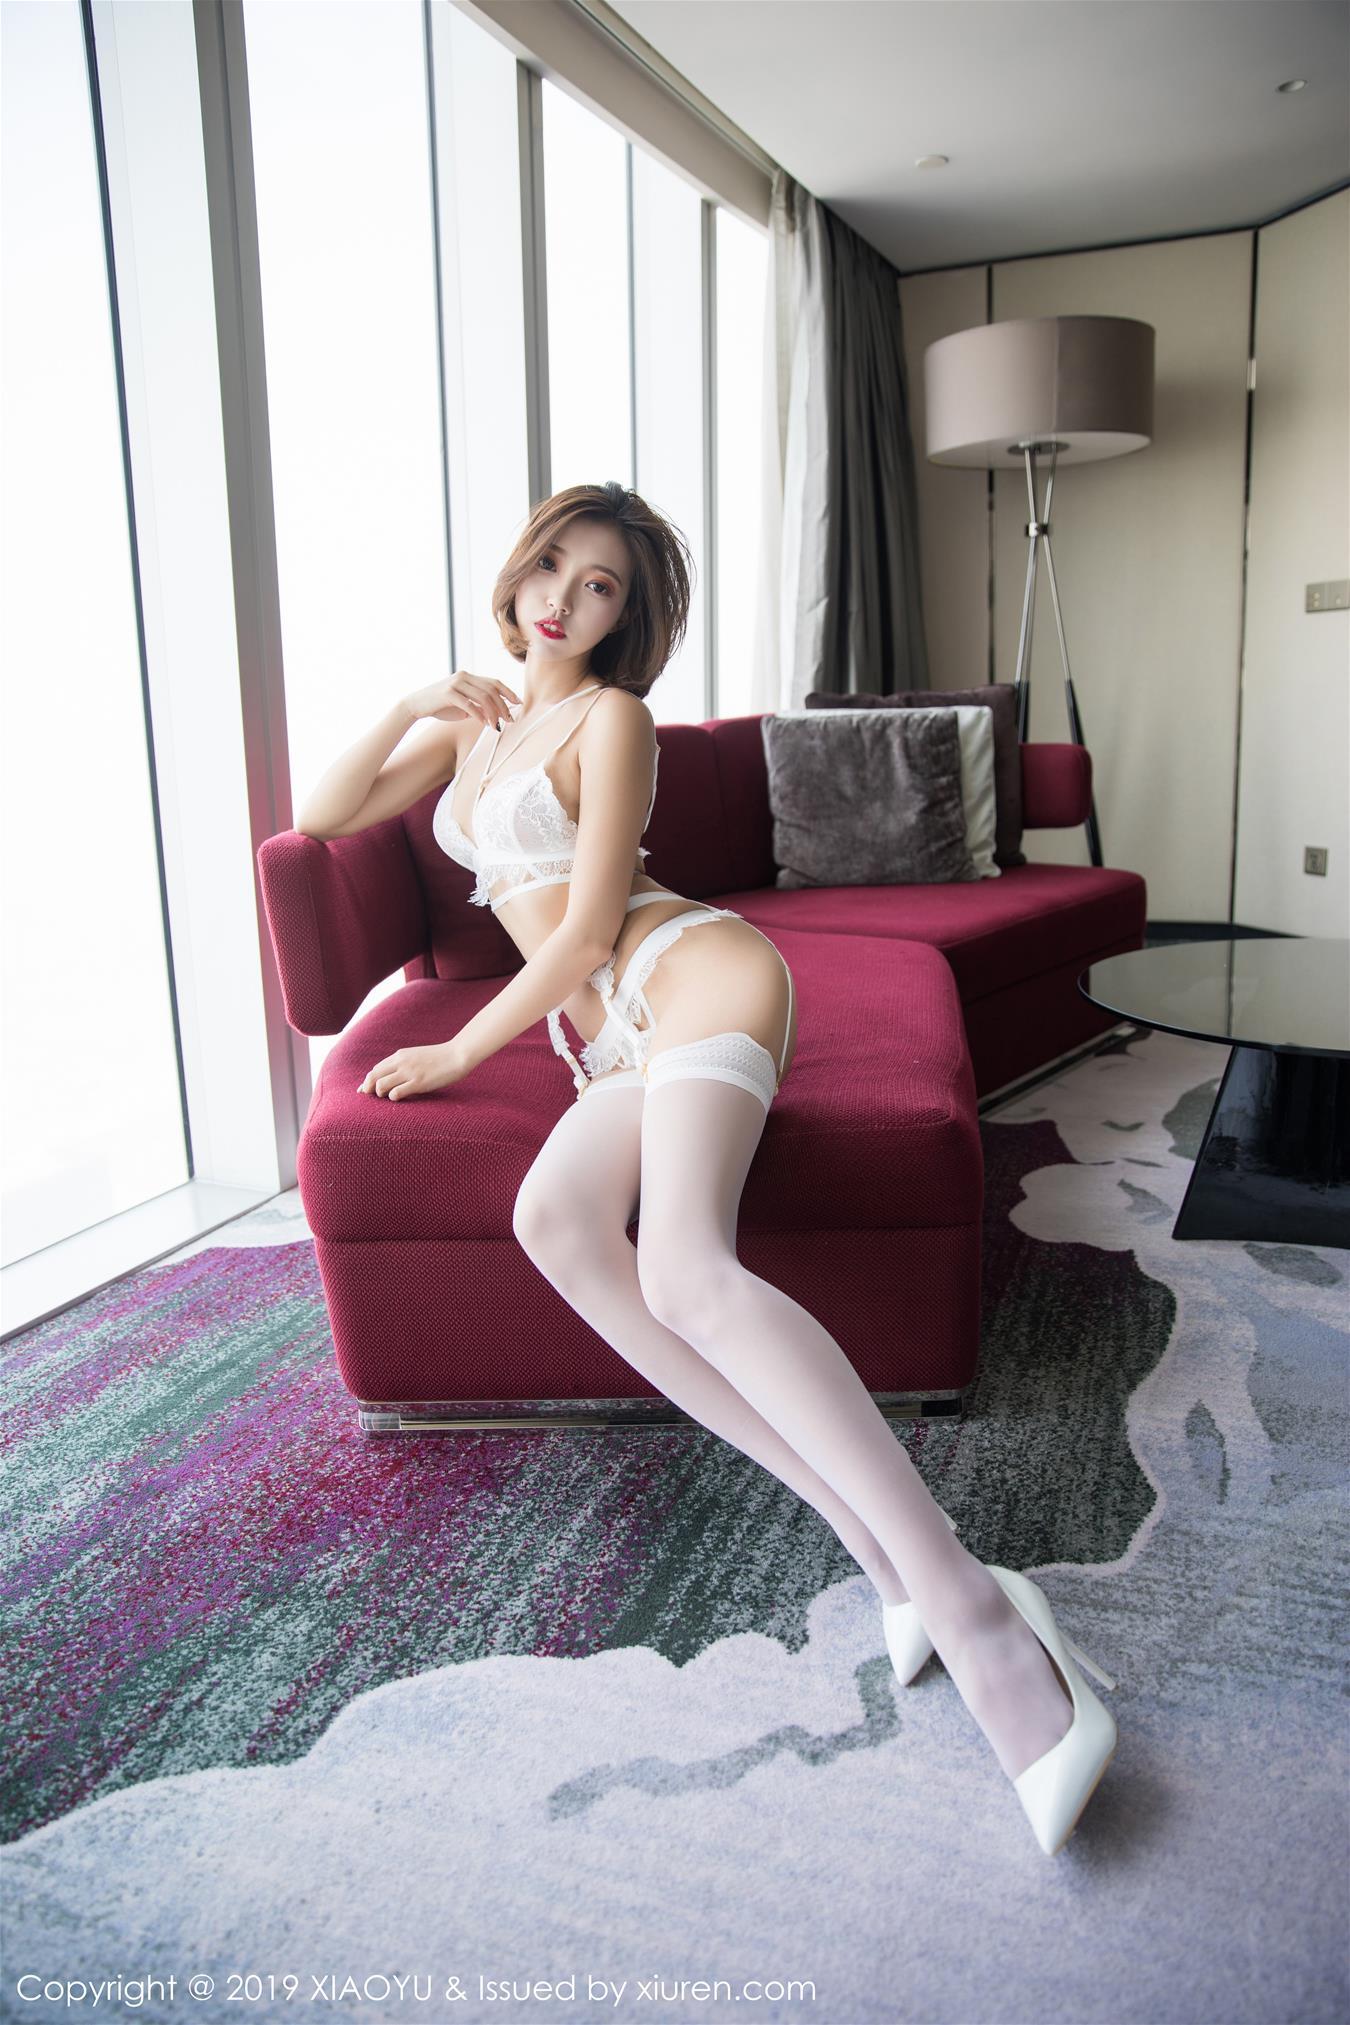 [XIAOYU] 语画界 2019.04.17 VOL.053 冯木木LRIS [59P-202MB] 人气女神-第3张